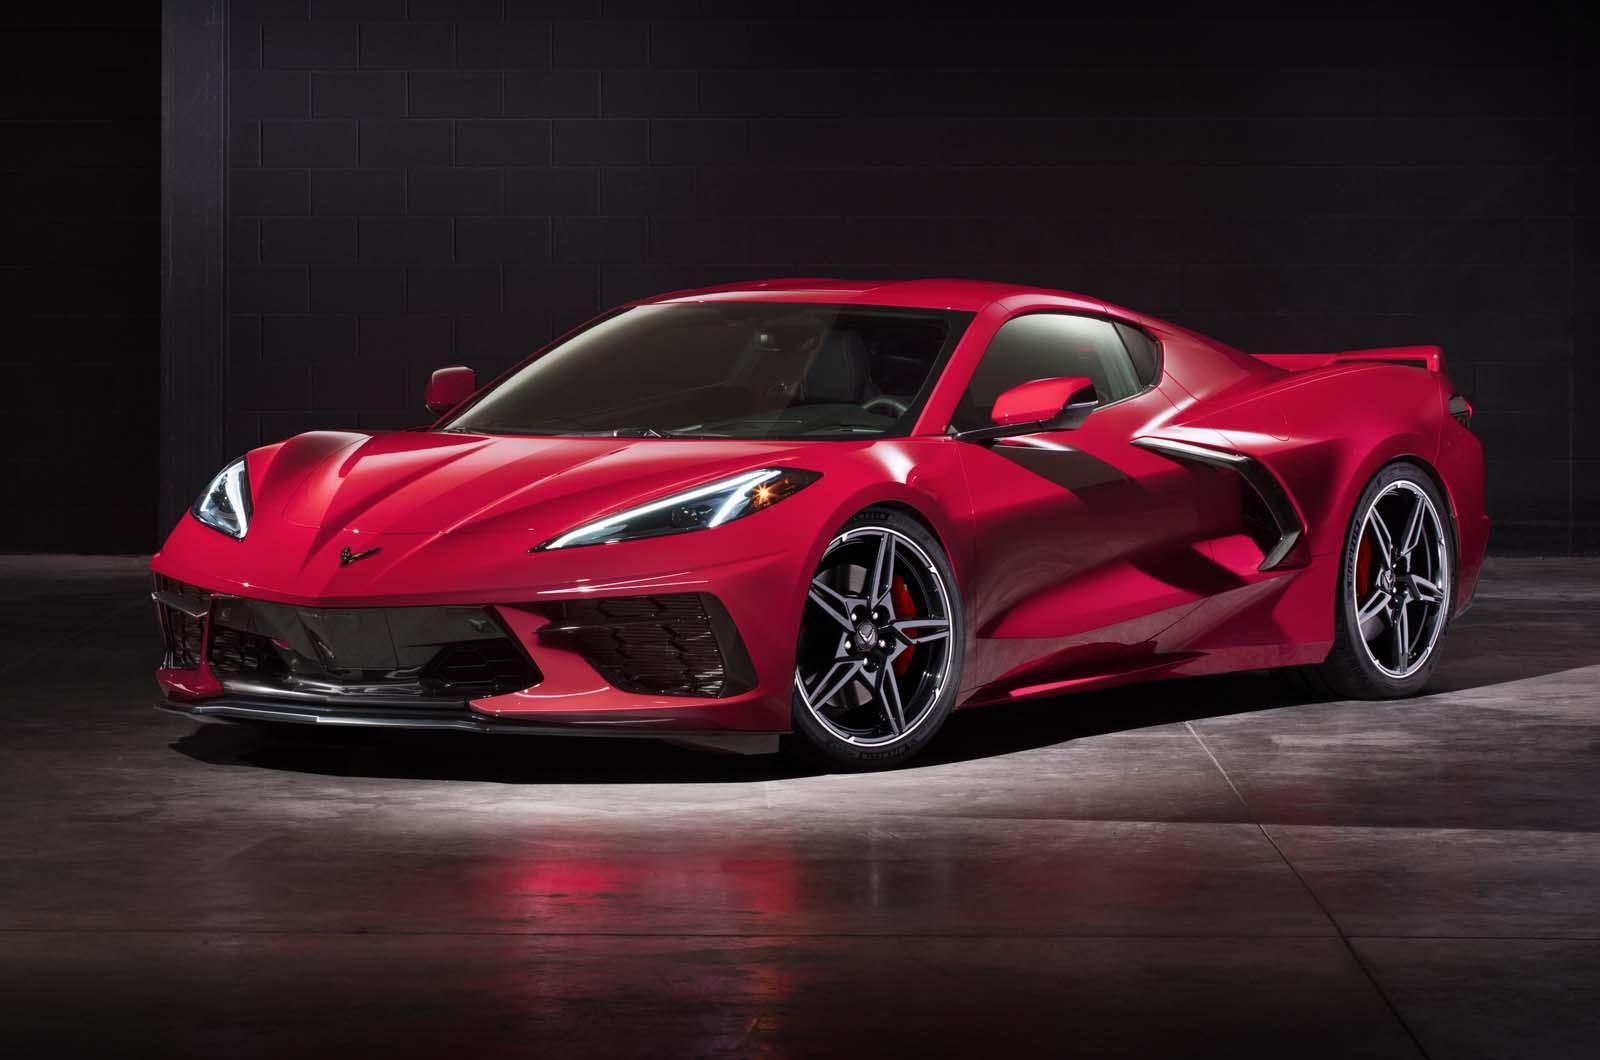 Kelebihan Chevrolet Corvette Spesifikasi